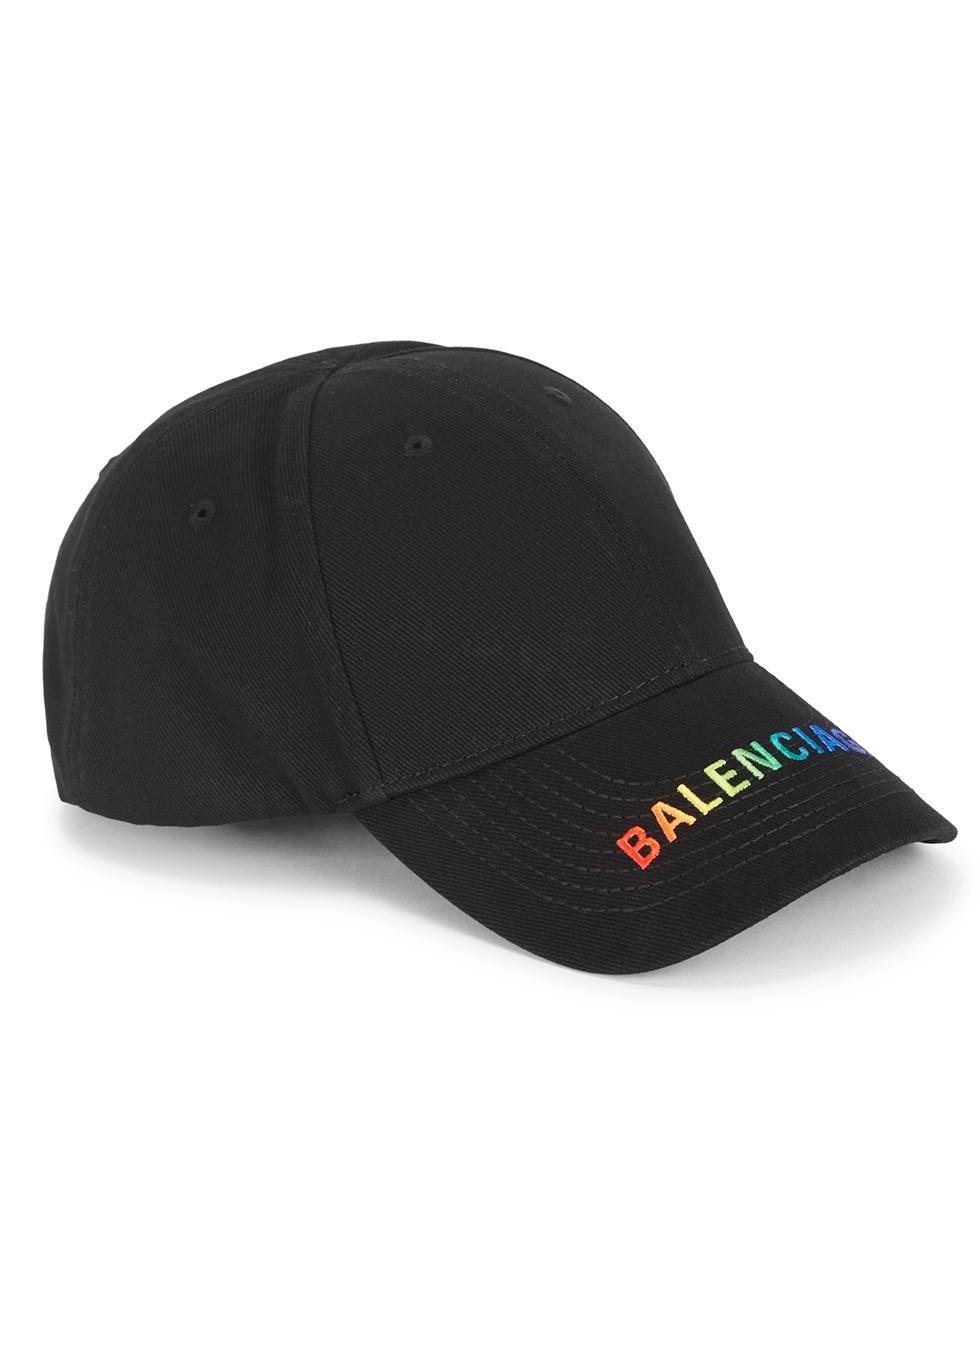 a2e839ce5849c Men s Designer Caps - Luxury Brands - Harvey Nichols